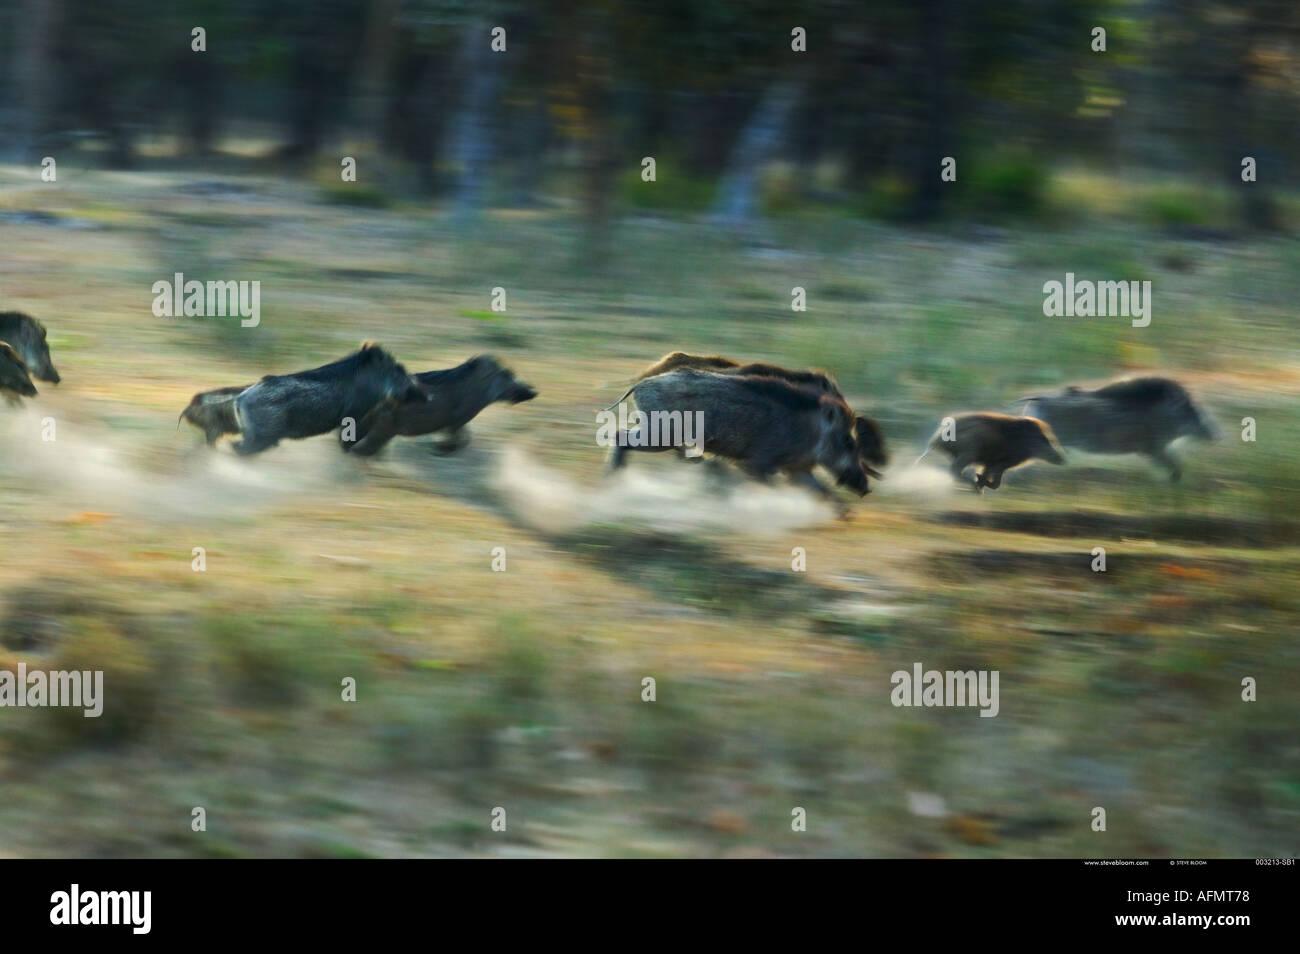 Herd of stampeding Indian Wild Boar Bandhavgarh India - Stock Image